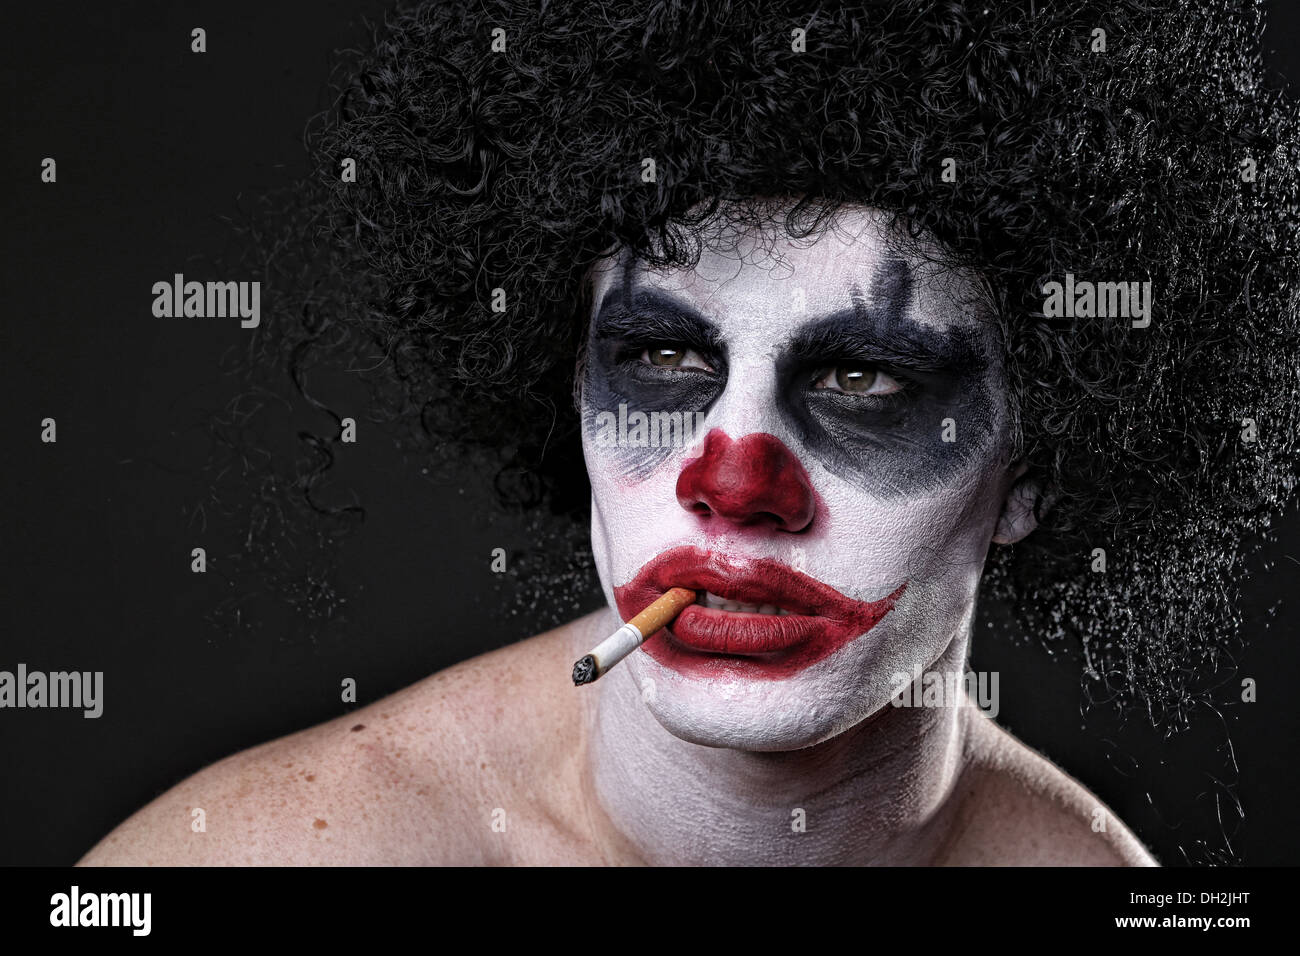 Evil Spooky Clown Portrait on Black Background - Stock Image